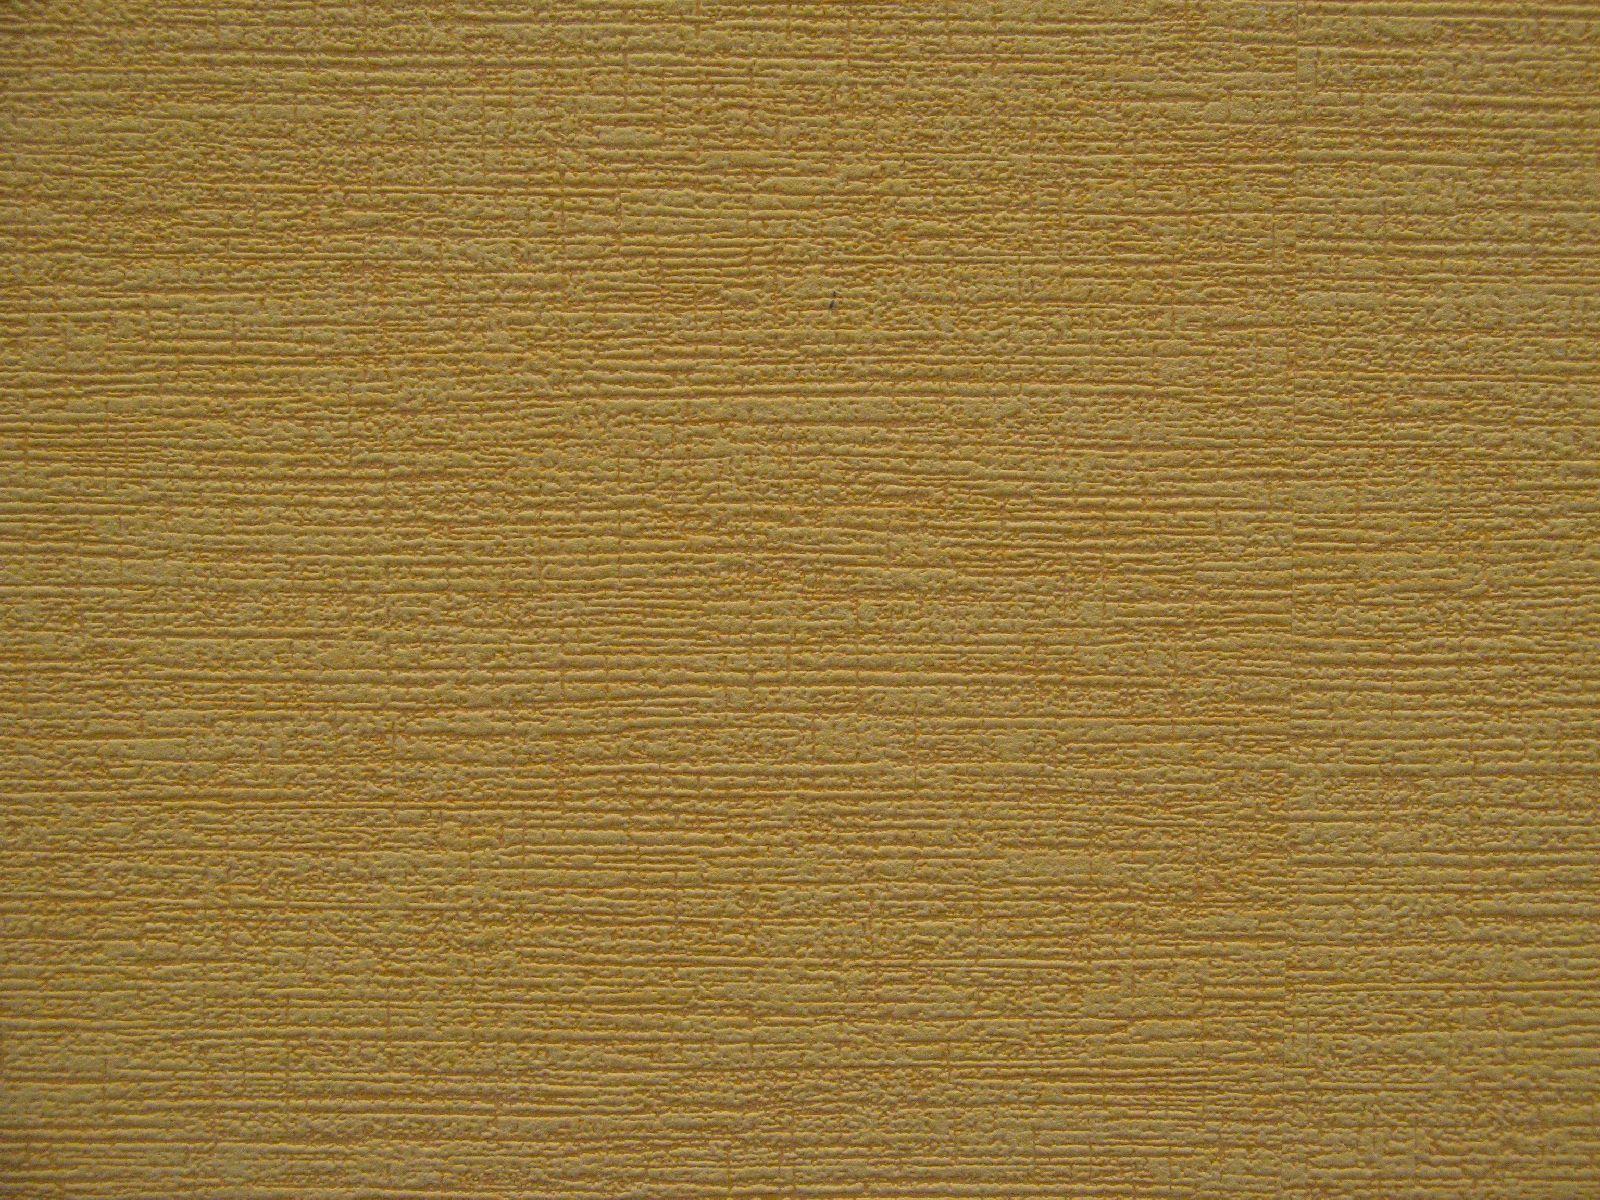 Innenraum-Material_Textur_B_4715